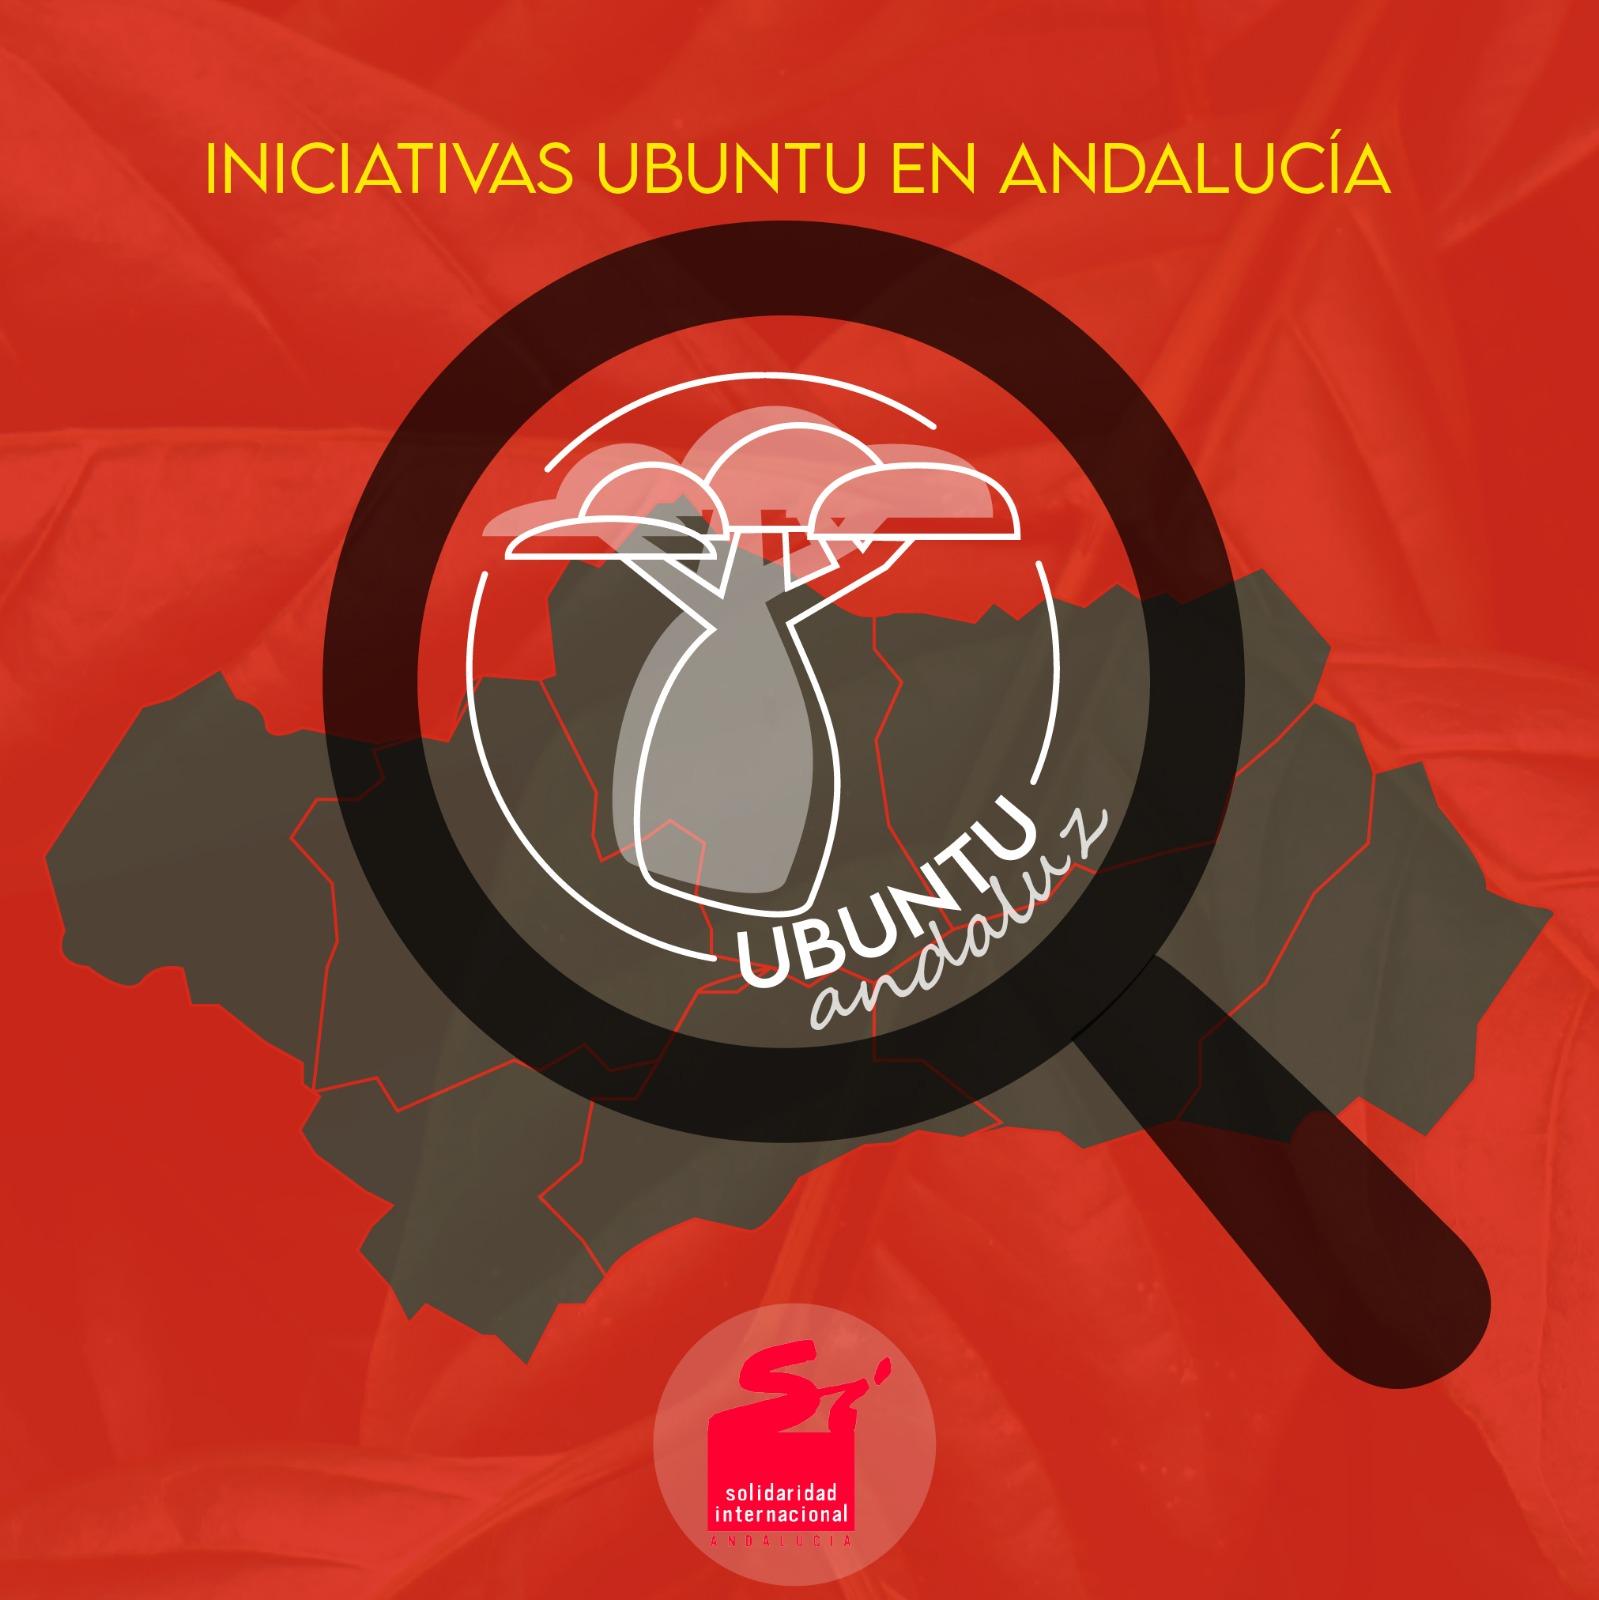 Iniciativas Ubuntu en Andalucia